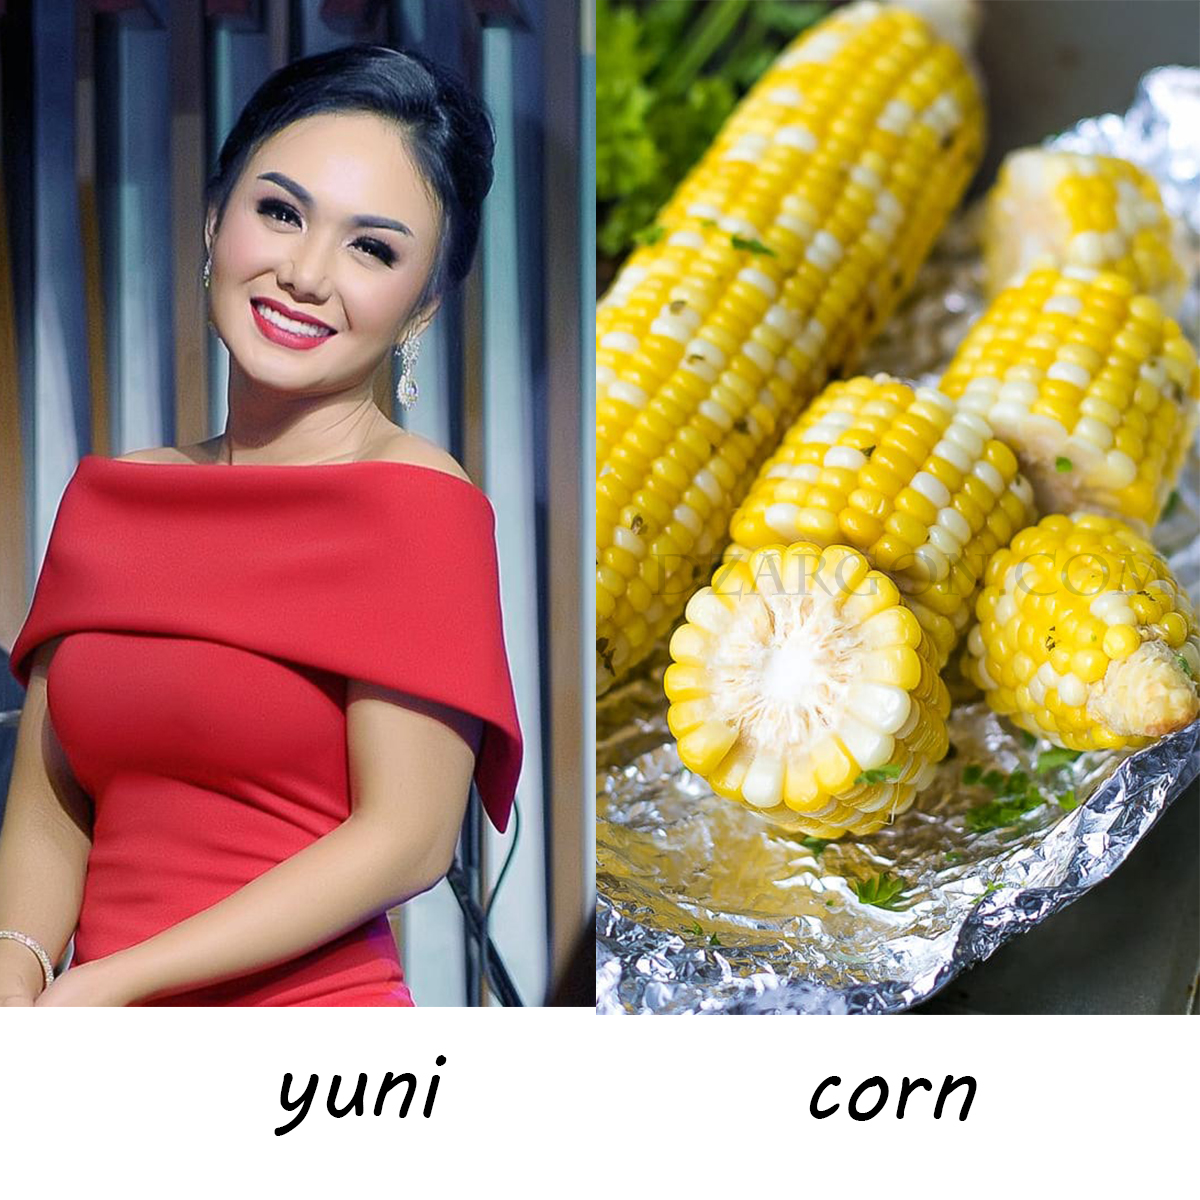 Unicorn itu gabungan dari Yuni Shara dan Jagung rebus